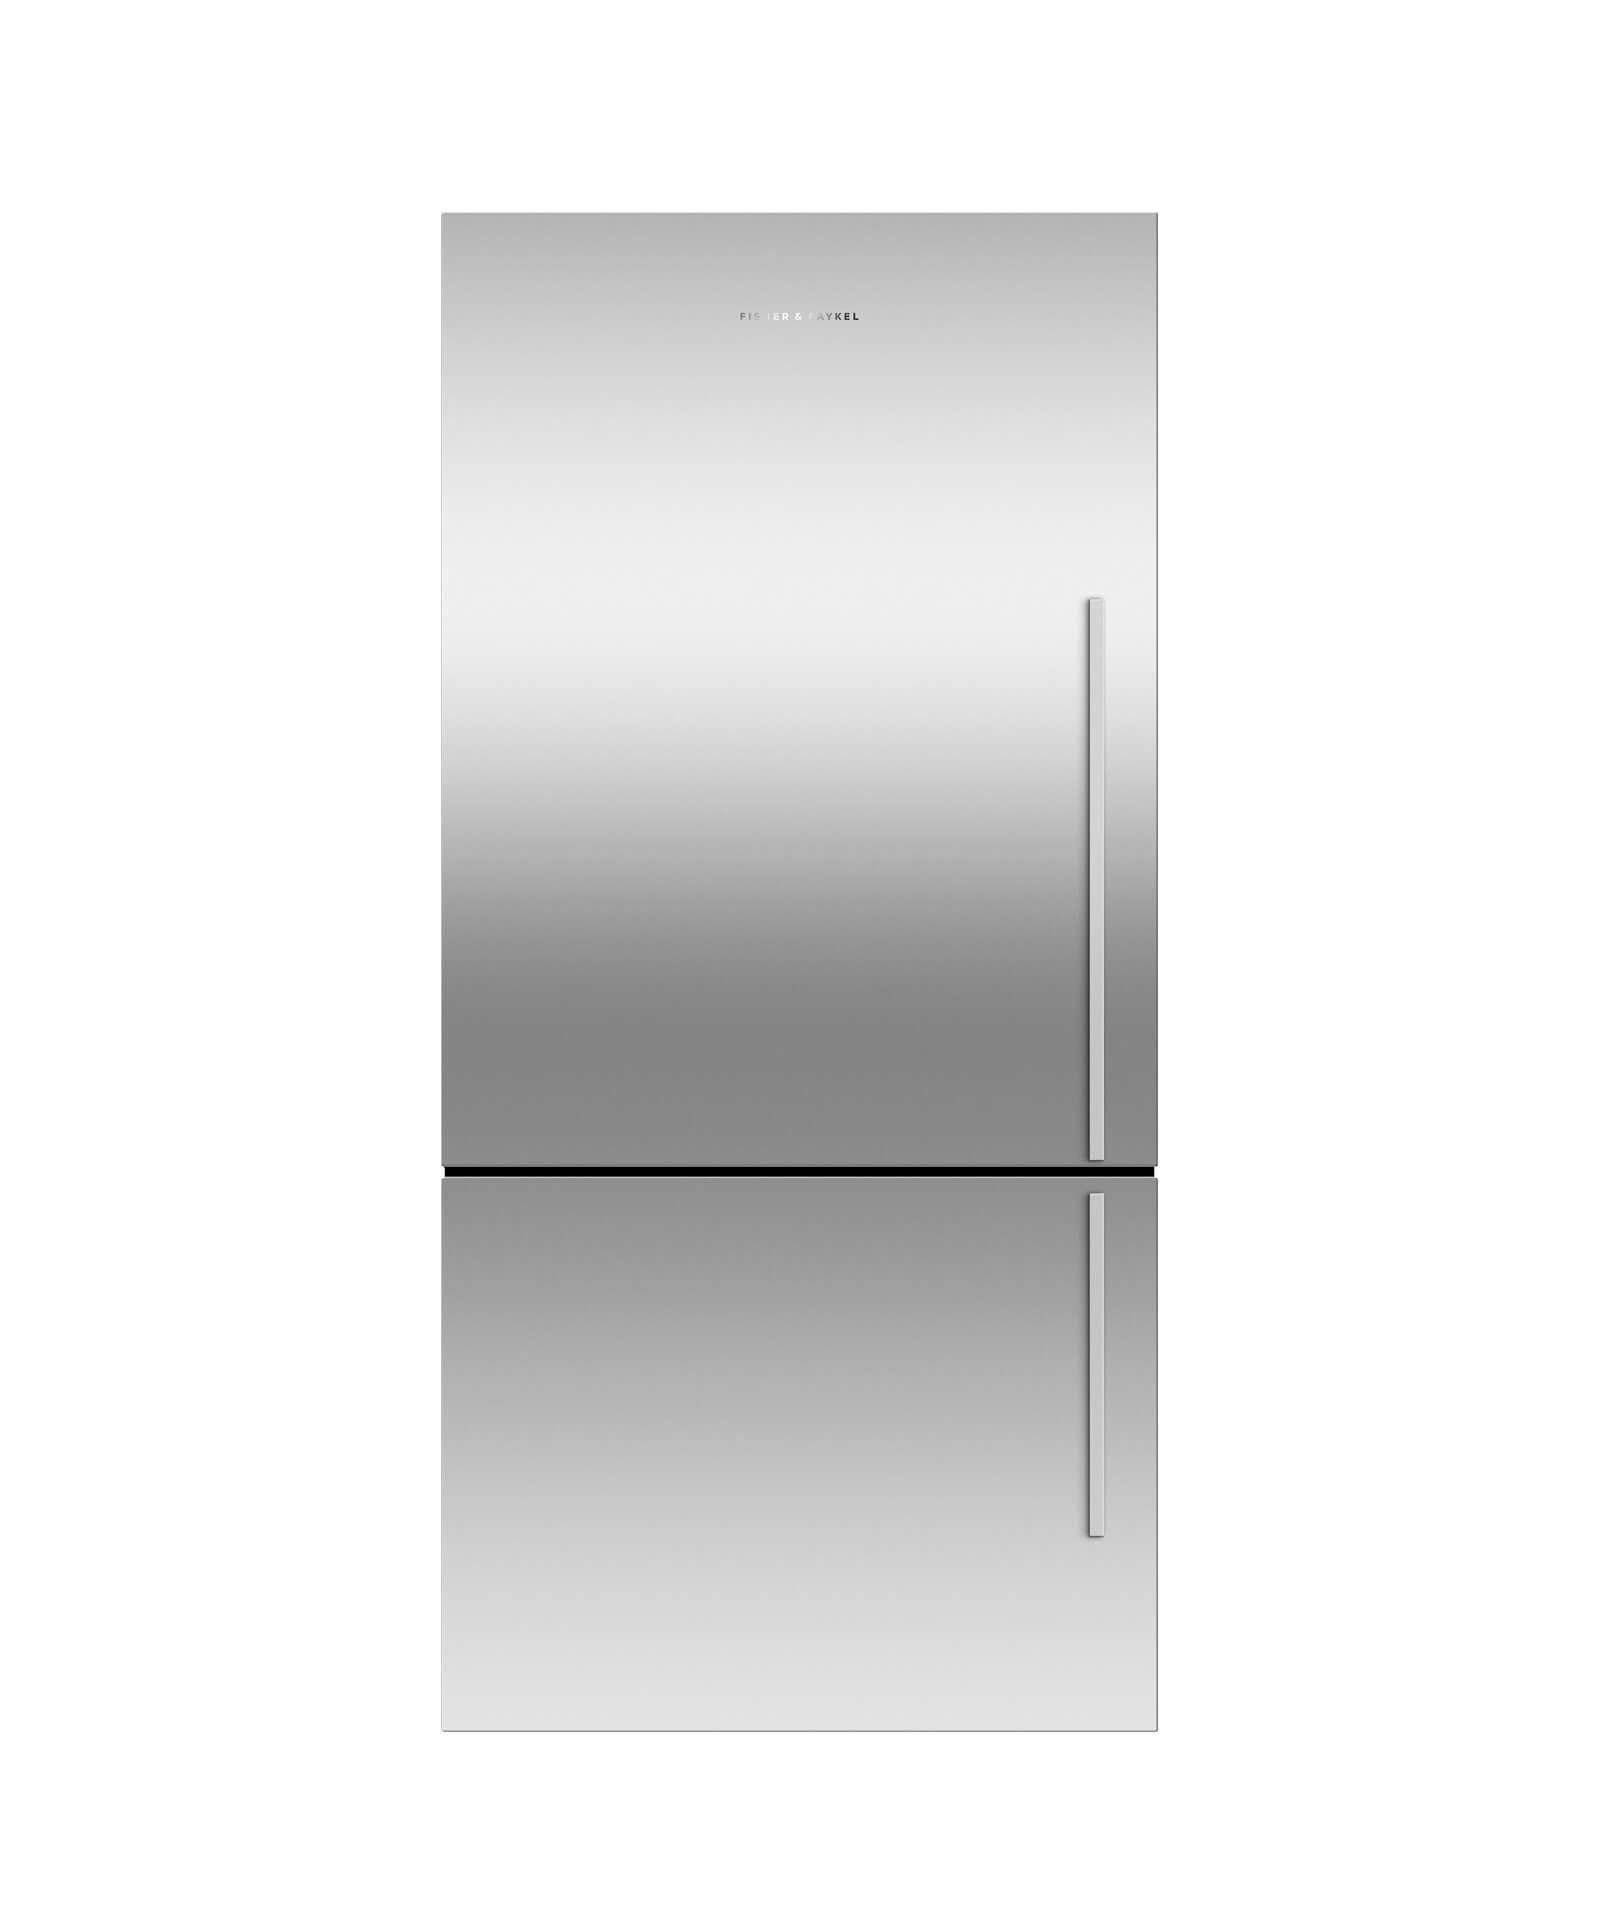 hight resolution of e522blxfd4 activesmart fridge 790mm bottom freezer 473l 25405